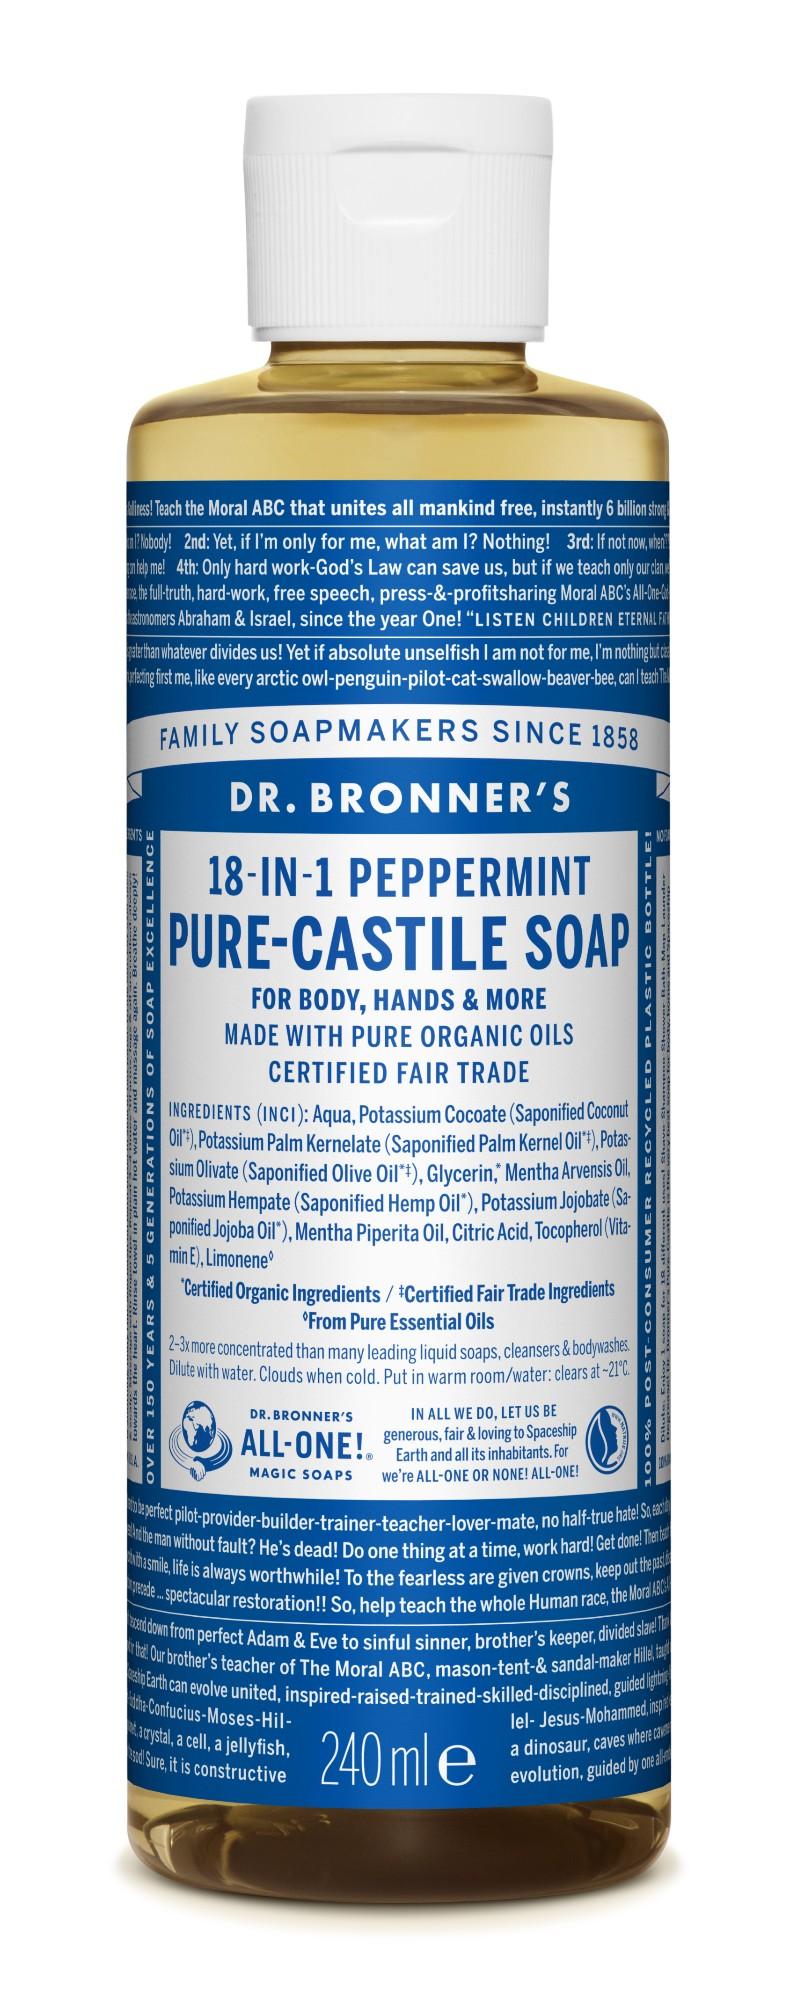 Ekologiškas tyras kastilietiškas skystas muilas DR. BRONNER'S Peppermint 240 ml